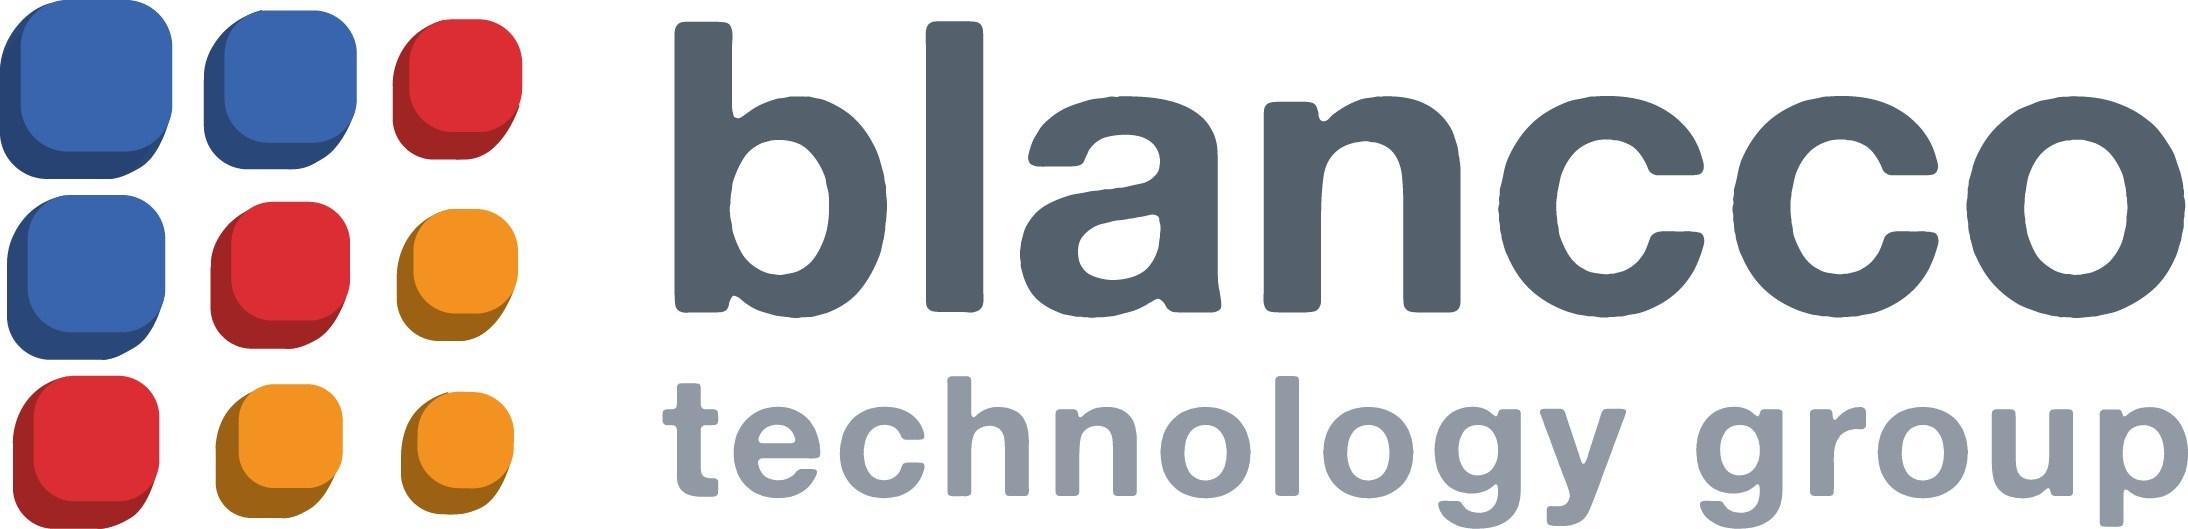 BTG logo (PRNewsFoto/Blancco Technology Group) (PRNewsfoto/Blancco Technology Group)